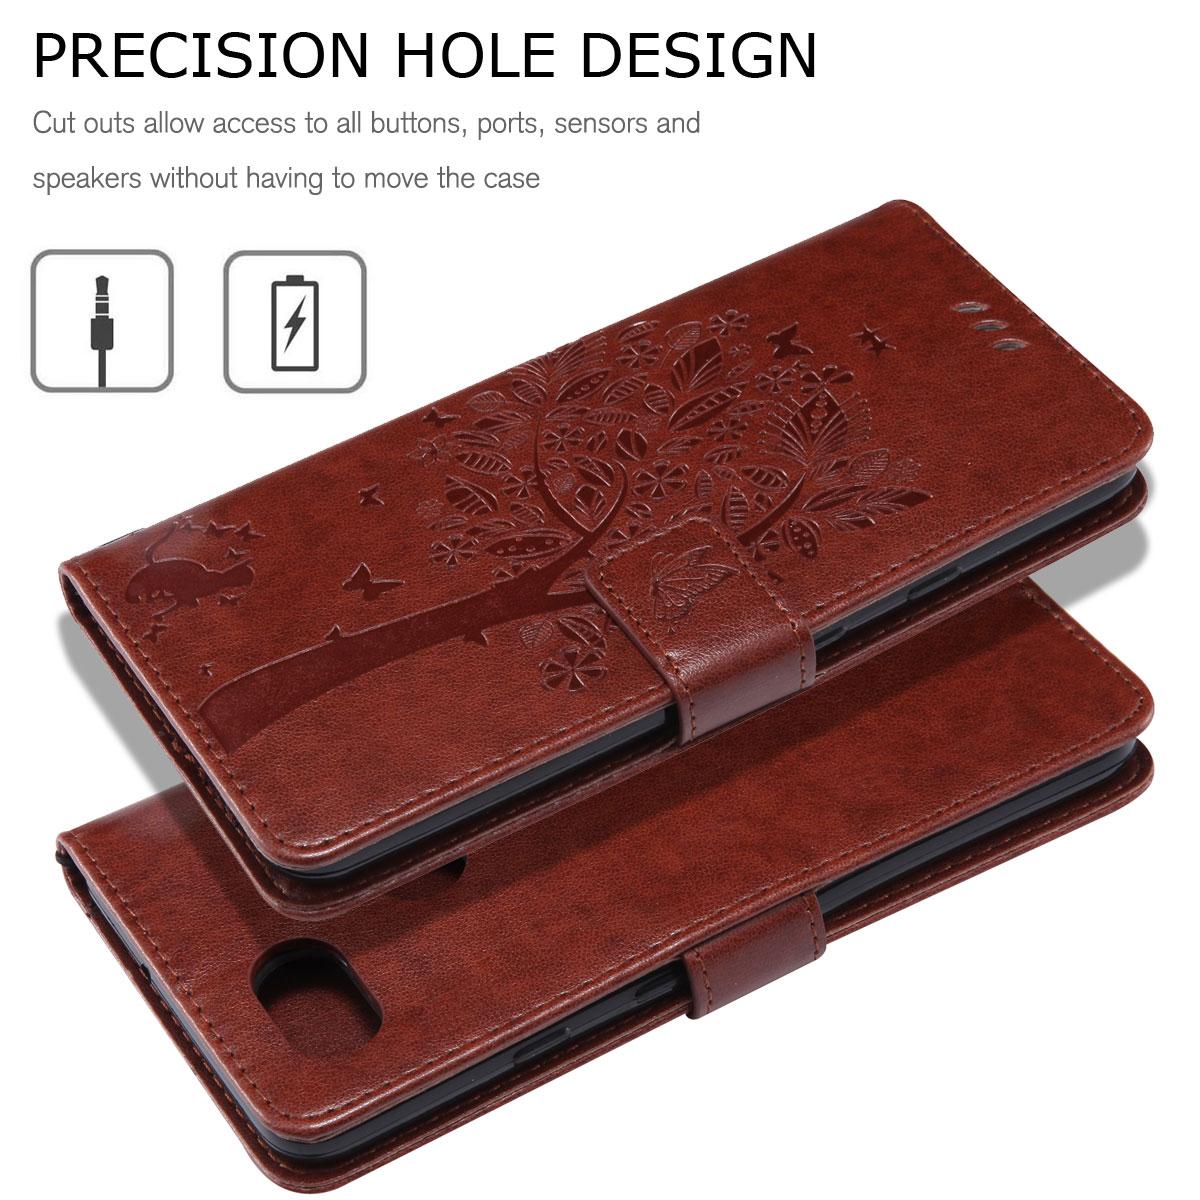 Magnetic-Leather-Credit-Card-Holder-Flip-Case-Cover-For-Google-Pixel-2-2-XL thumbnail 31